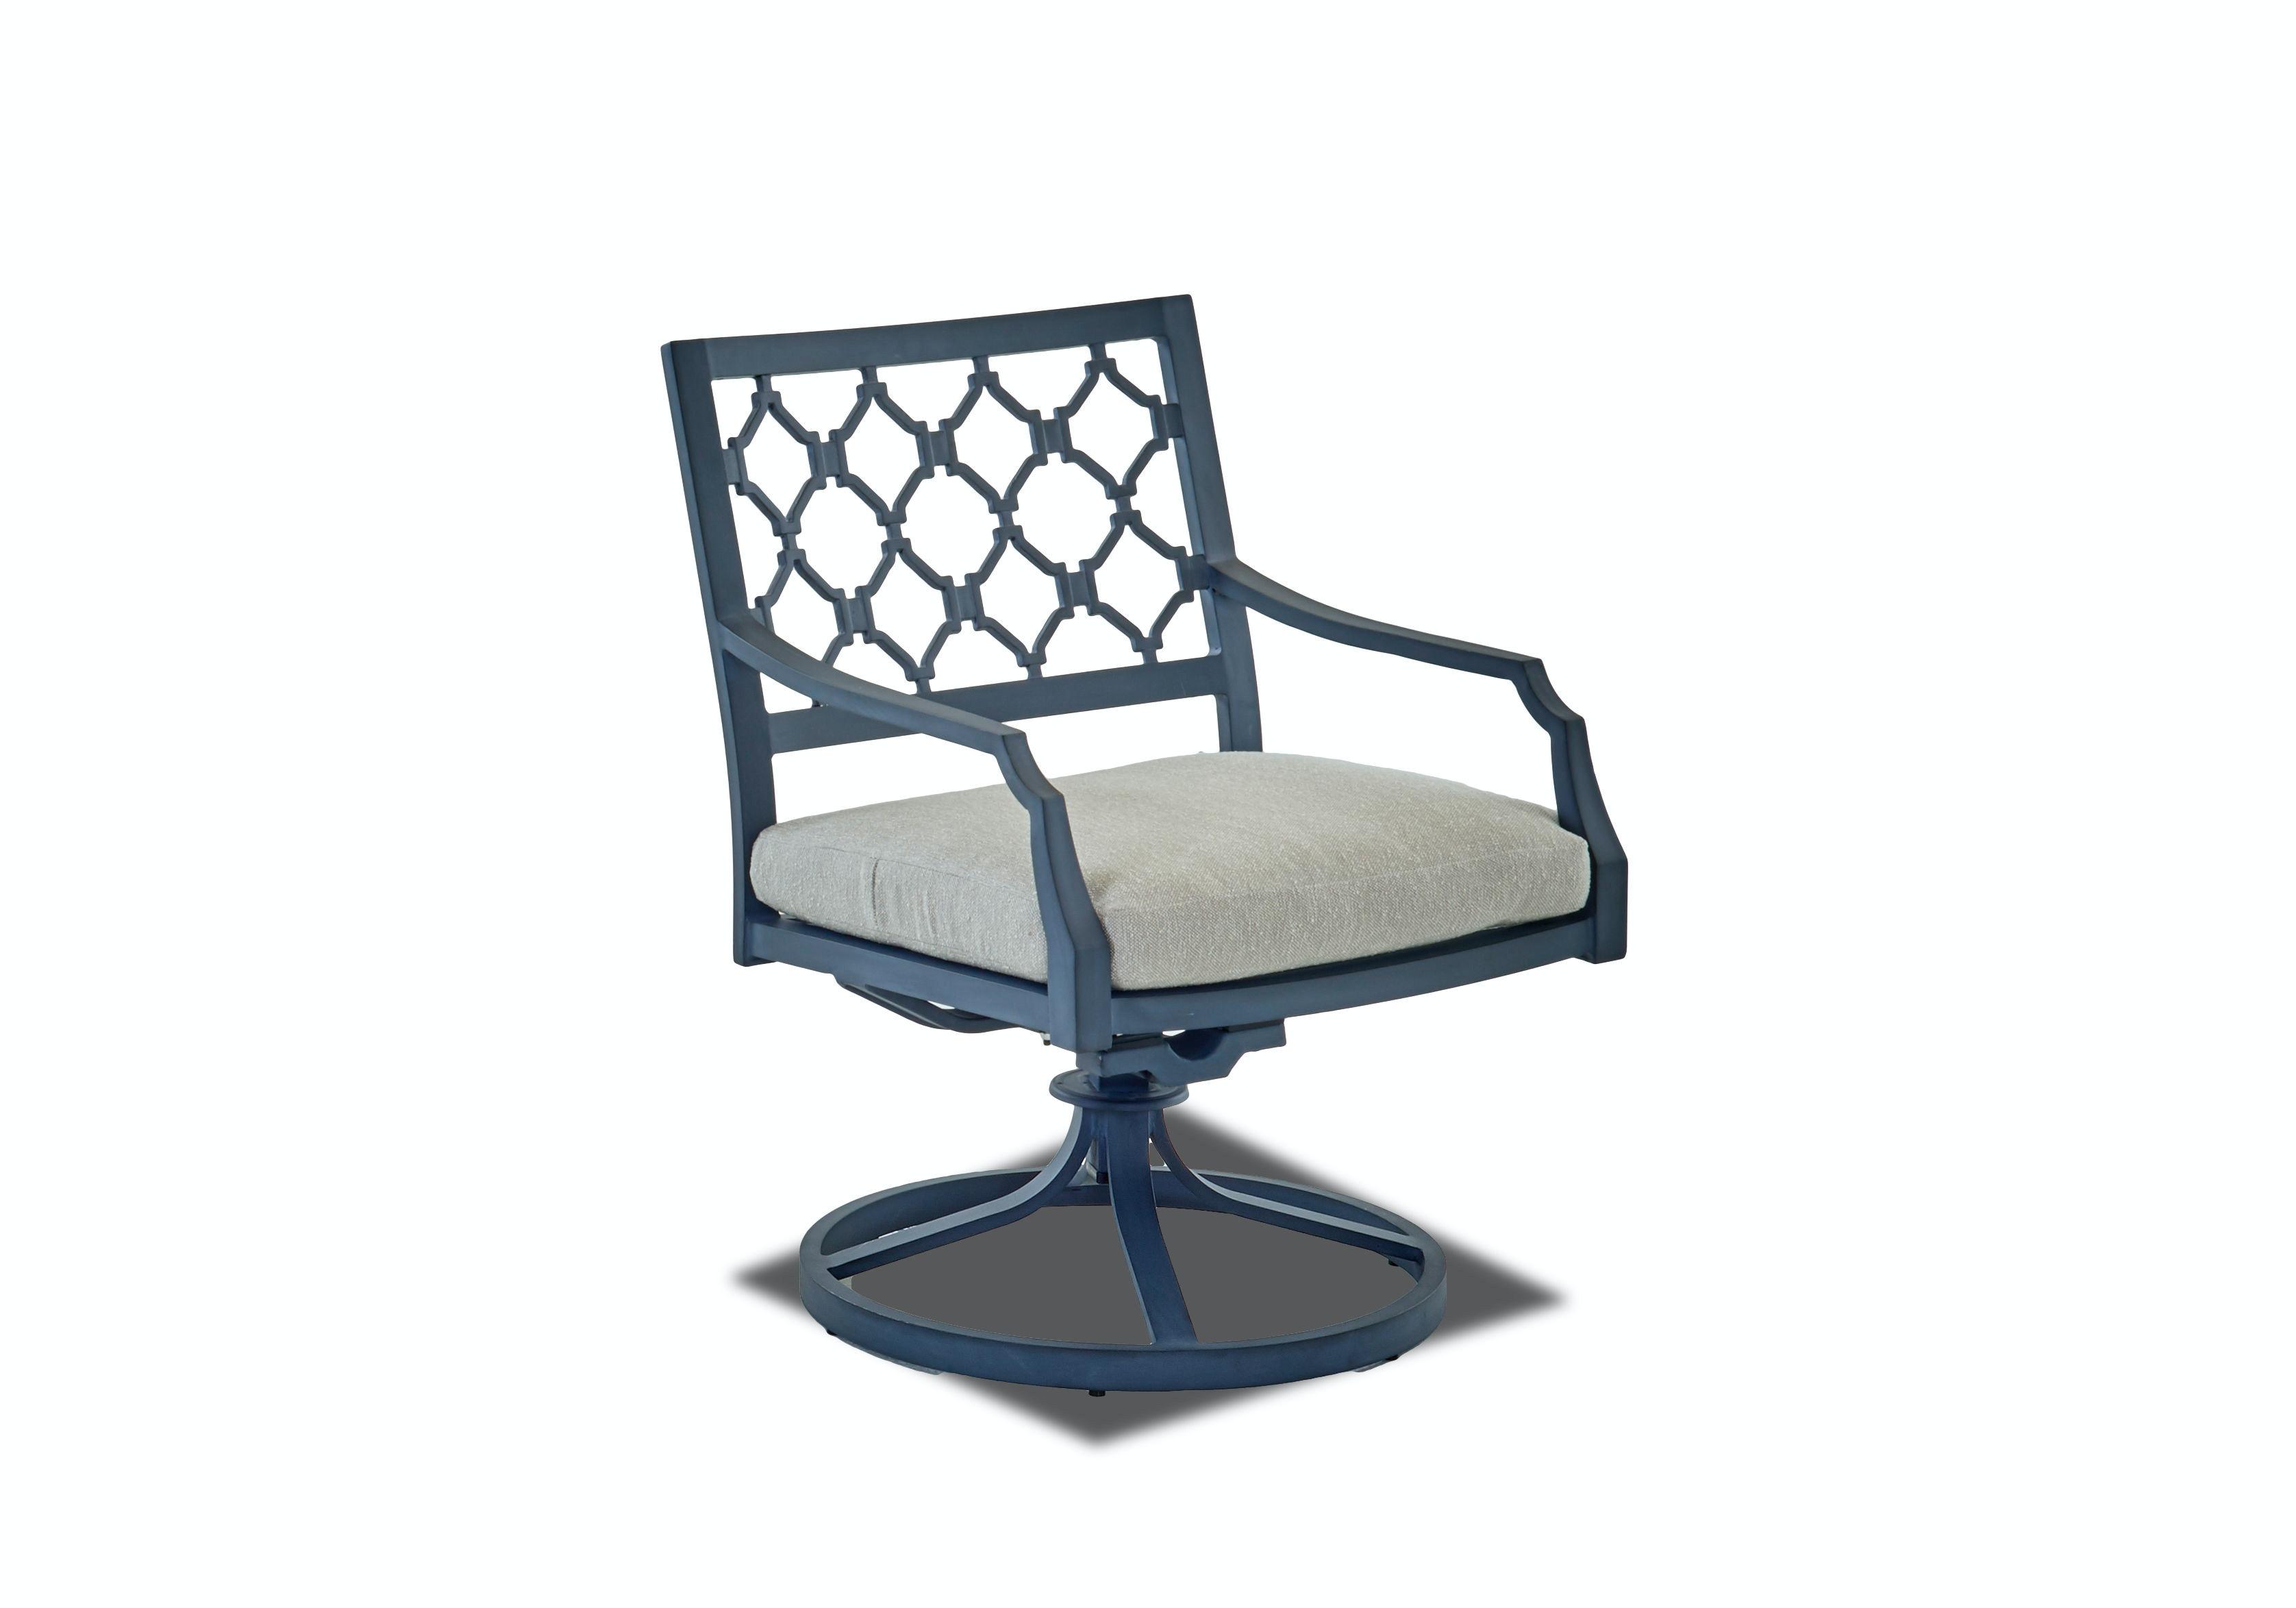 Klaussner Outdoor Mirage Swivel Rocking Dining Chair W2100 SRDC